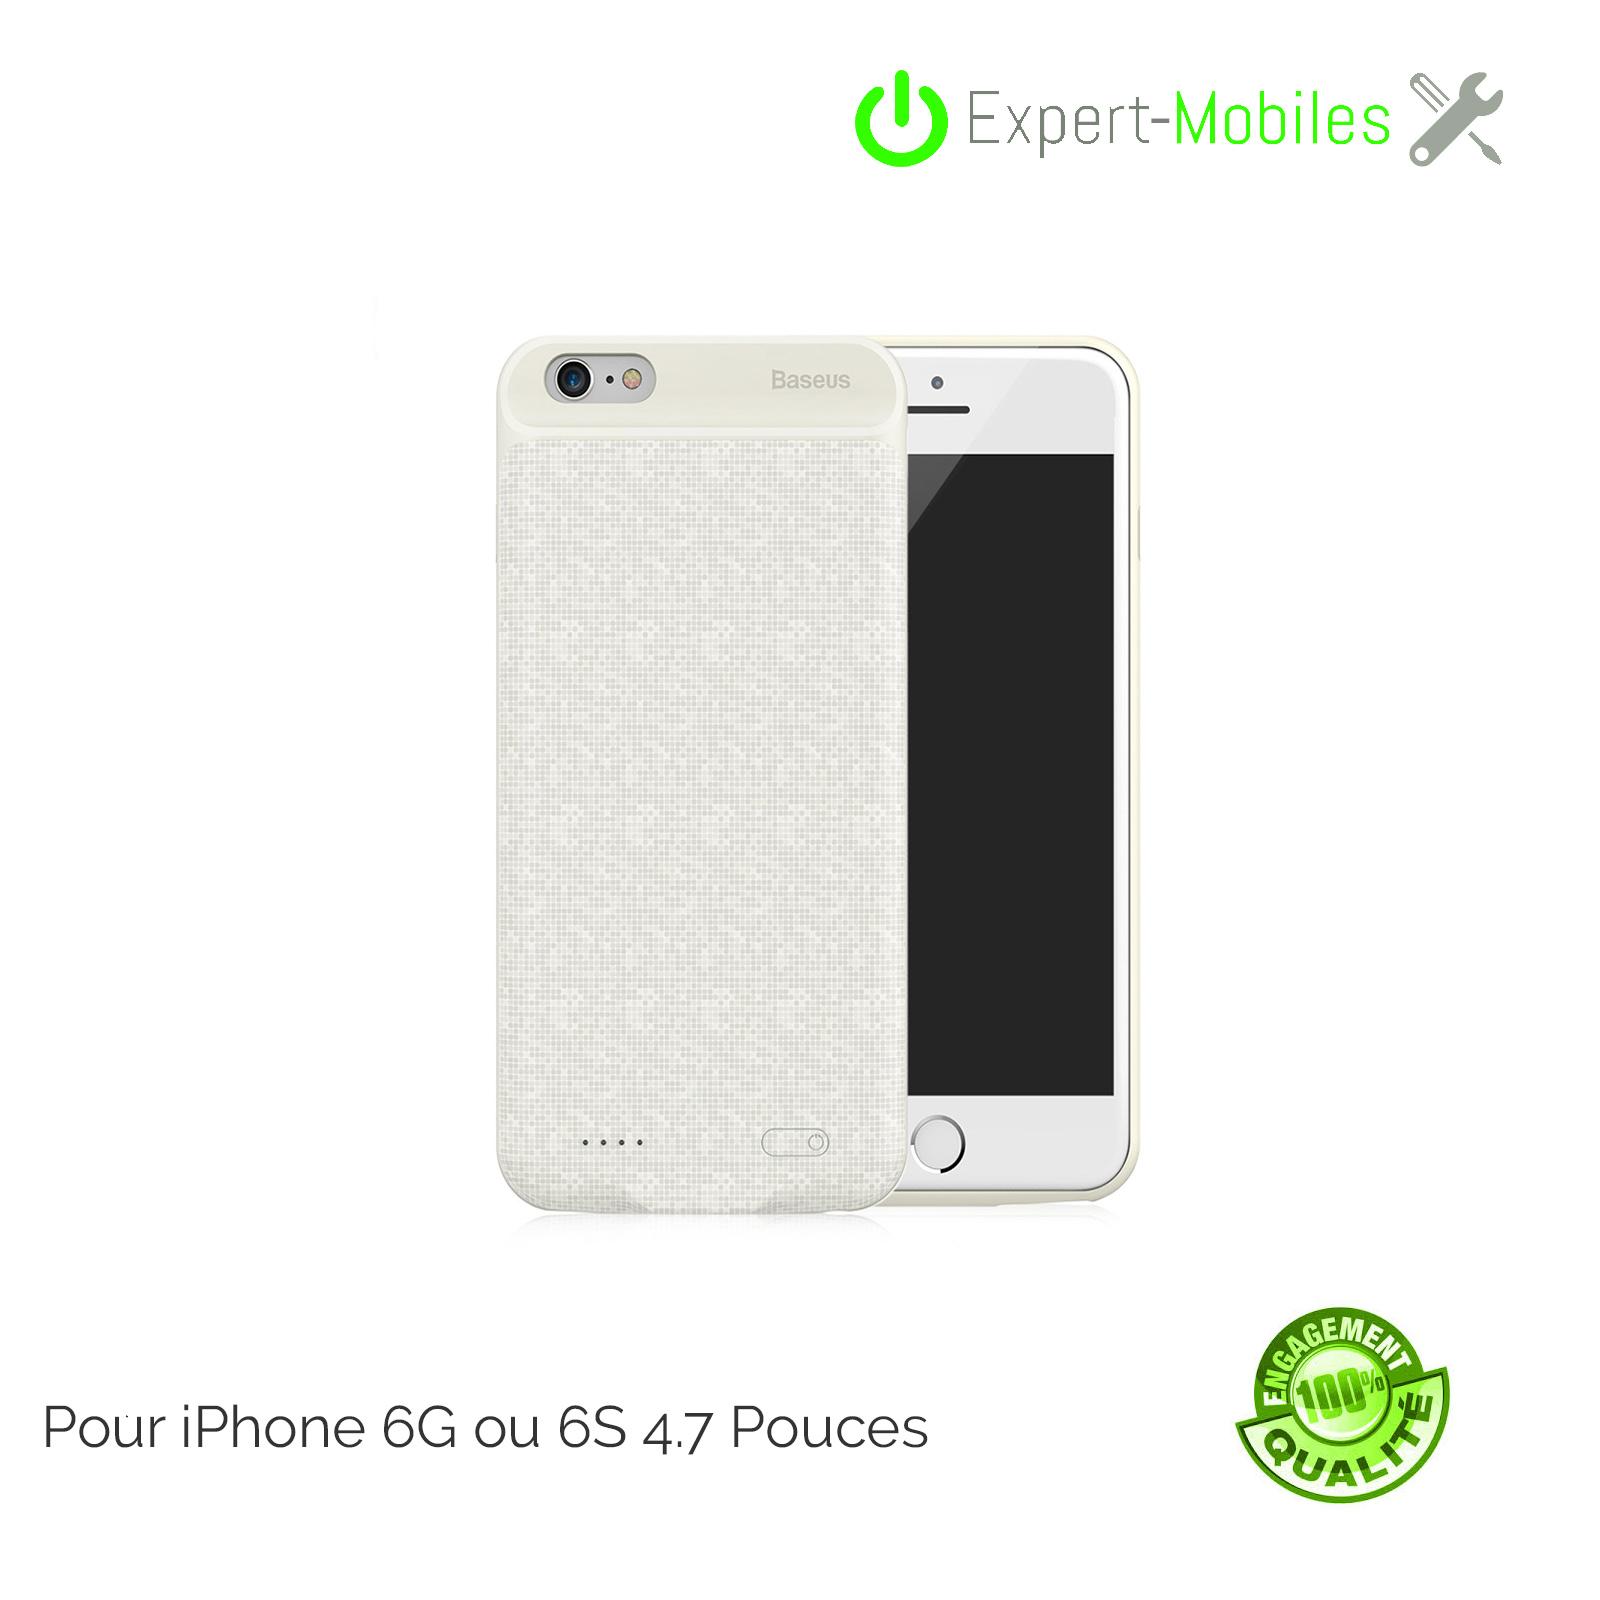 Coque chargeur baseus 2500 mah ivoire iphone 6g 6s 4 7 - Reparation telephone lorient ...